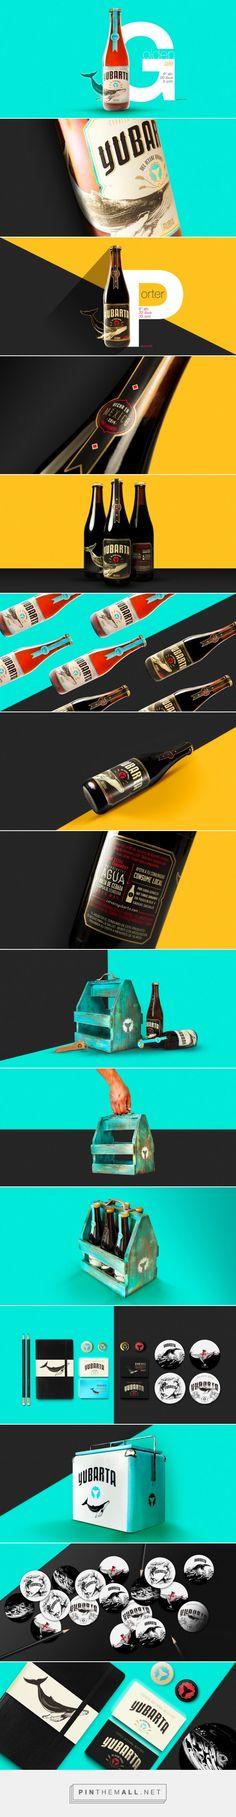 Yubarta - Packaging of the World - Creative Package Design Gallery  - http://www.packagingoftheworld.com/2015/07/yubarta.html